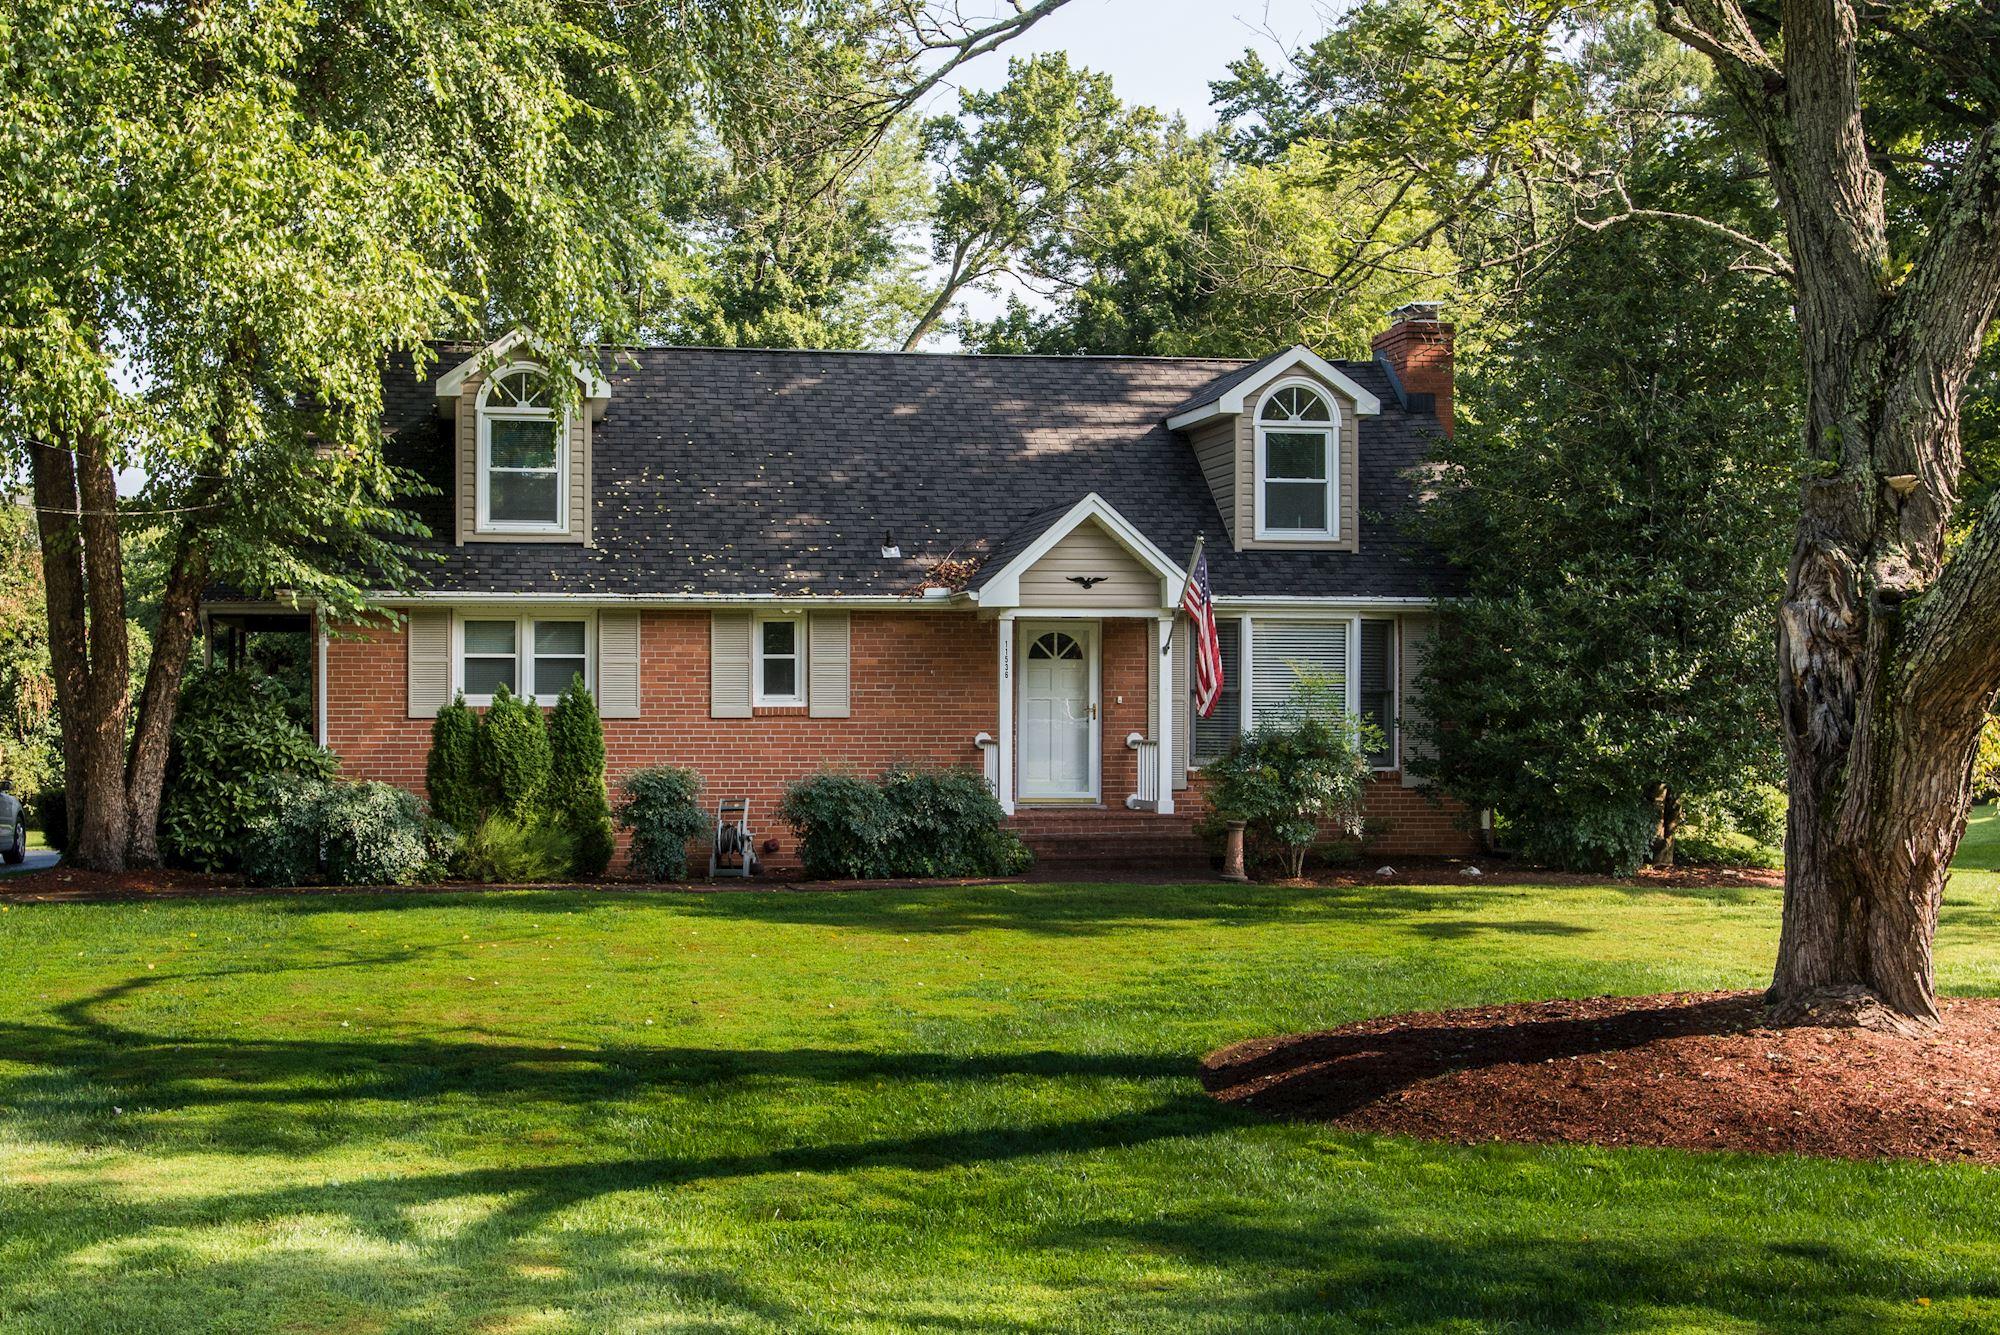 NEW LISTING: Single Family 3 BD Home in Heart of Fairfax, VA